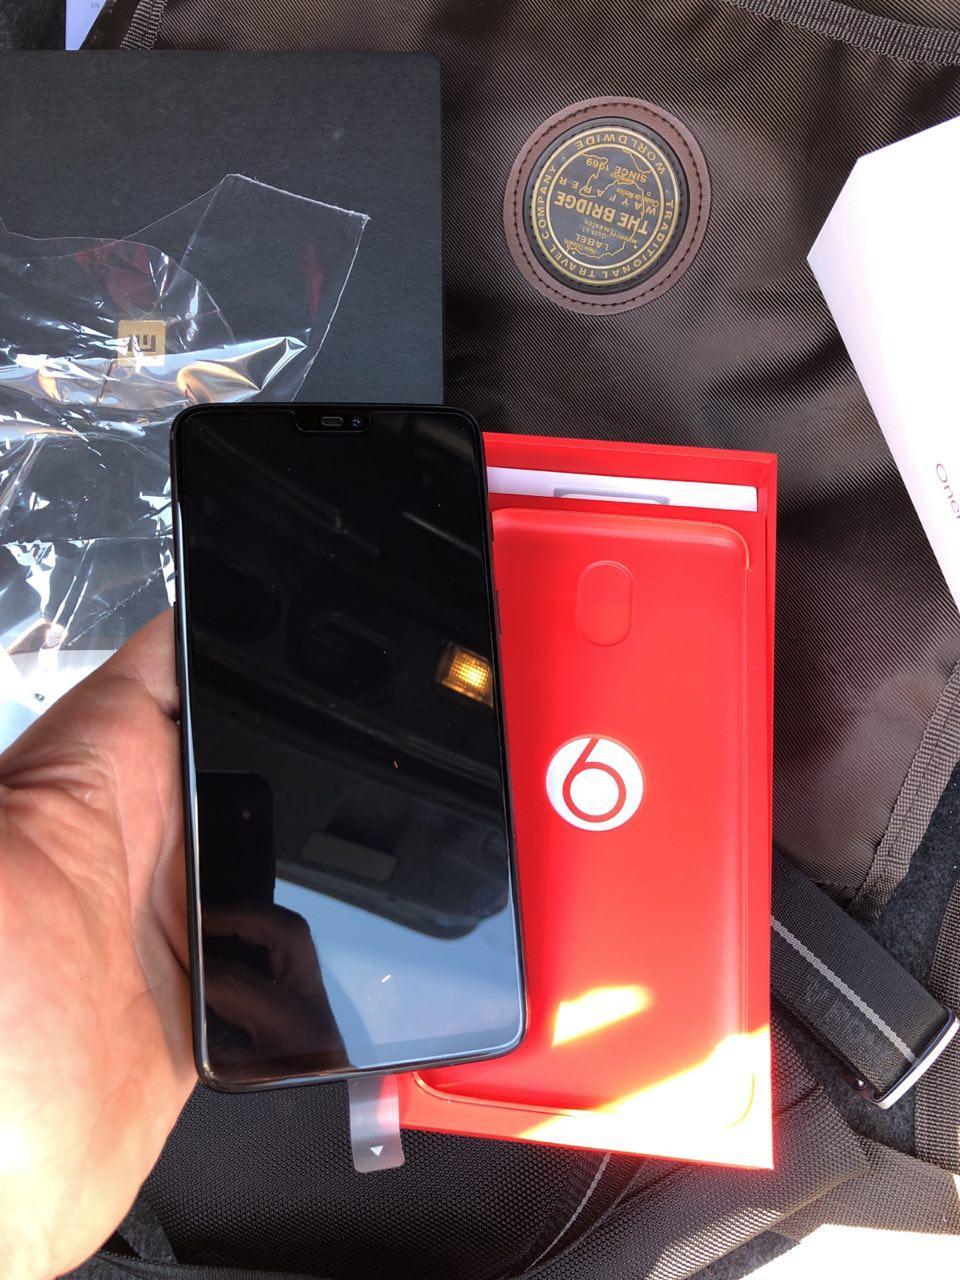 OnePlus 6 arrivato tramite Amazon | Evosmart.it